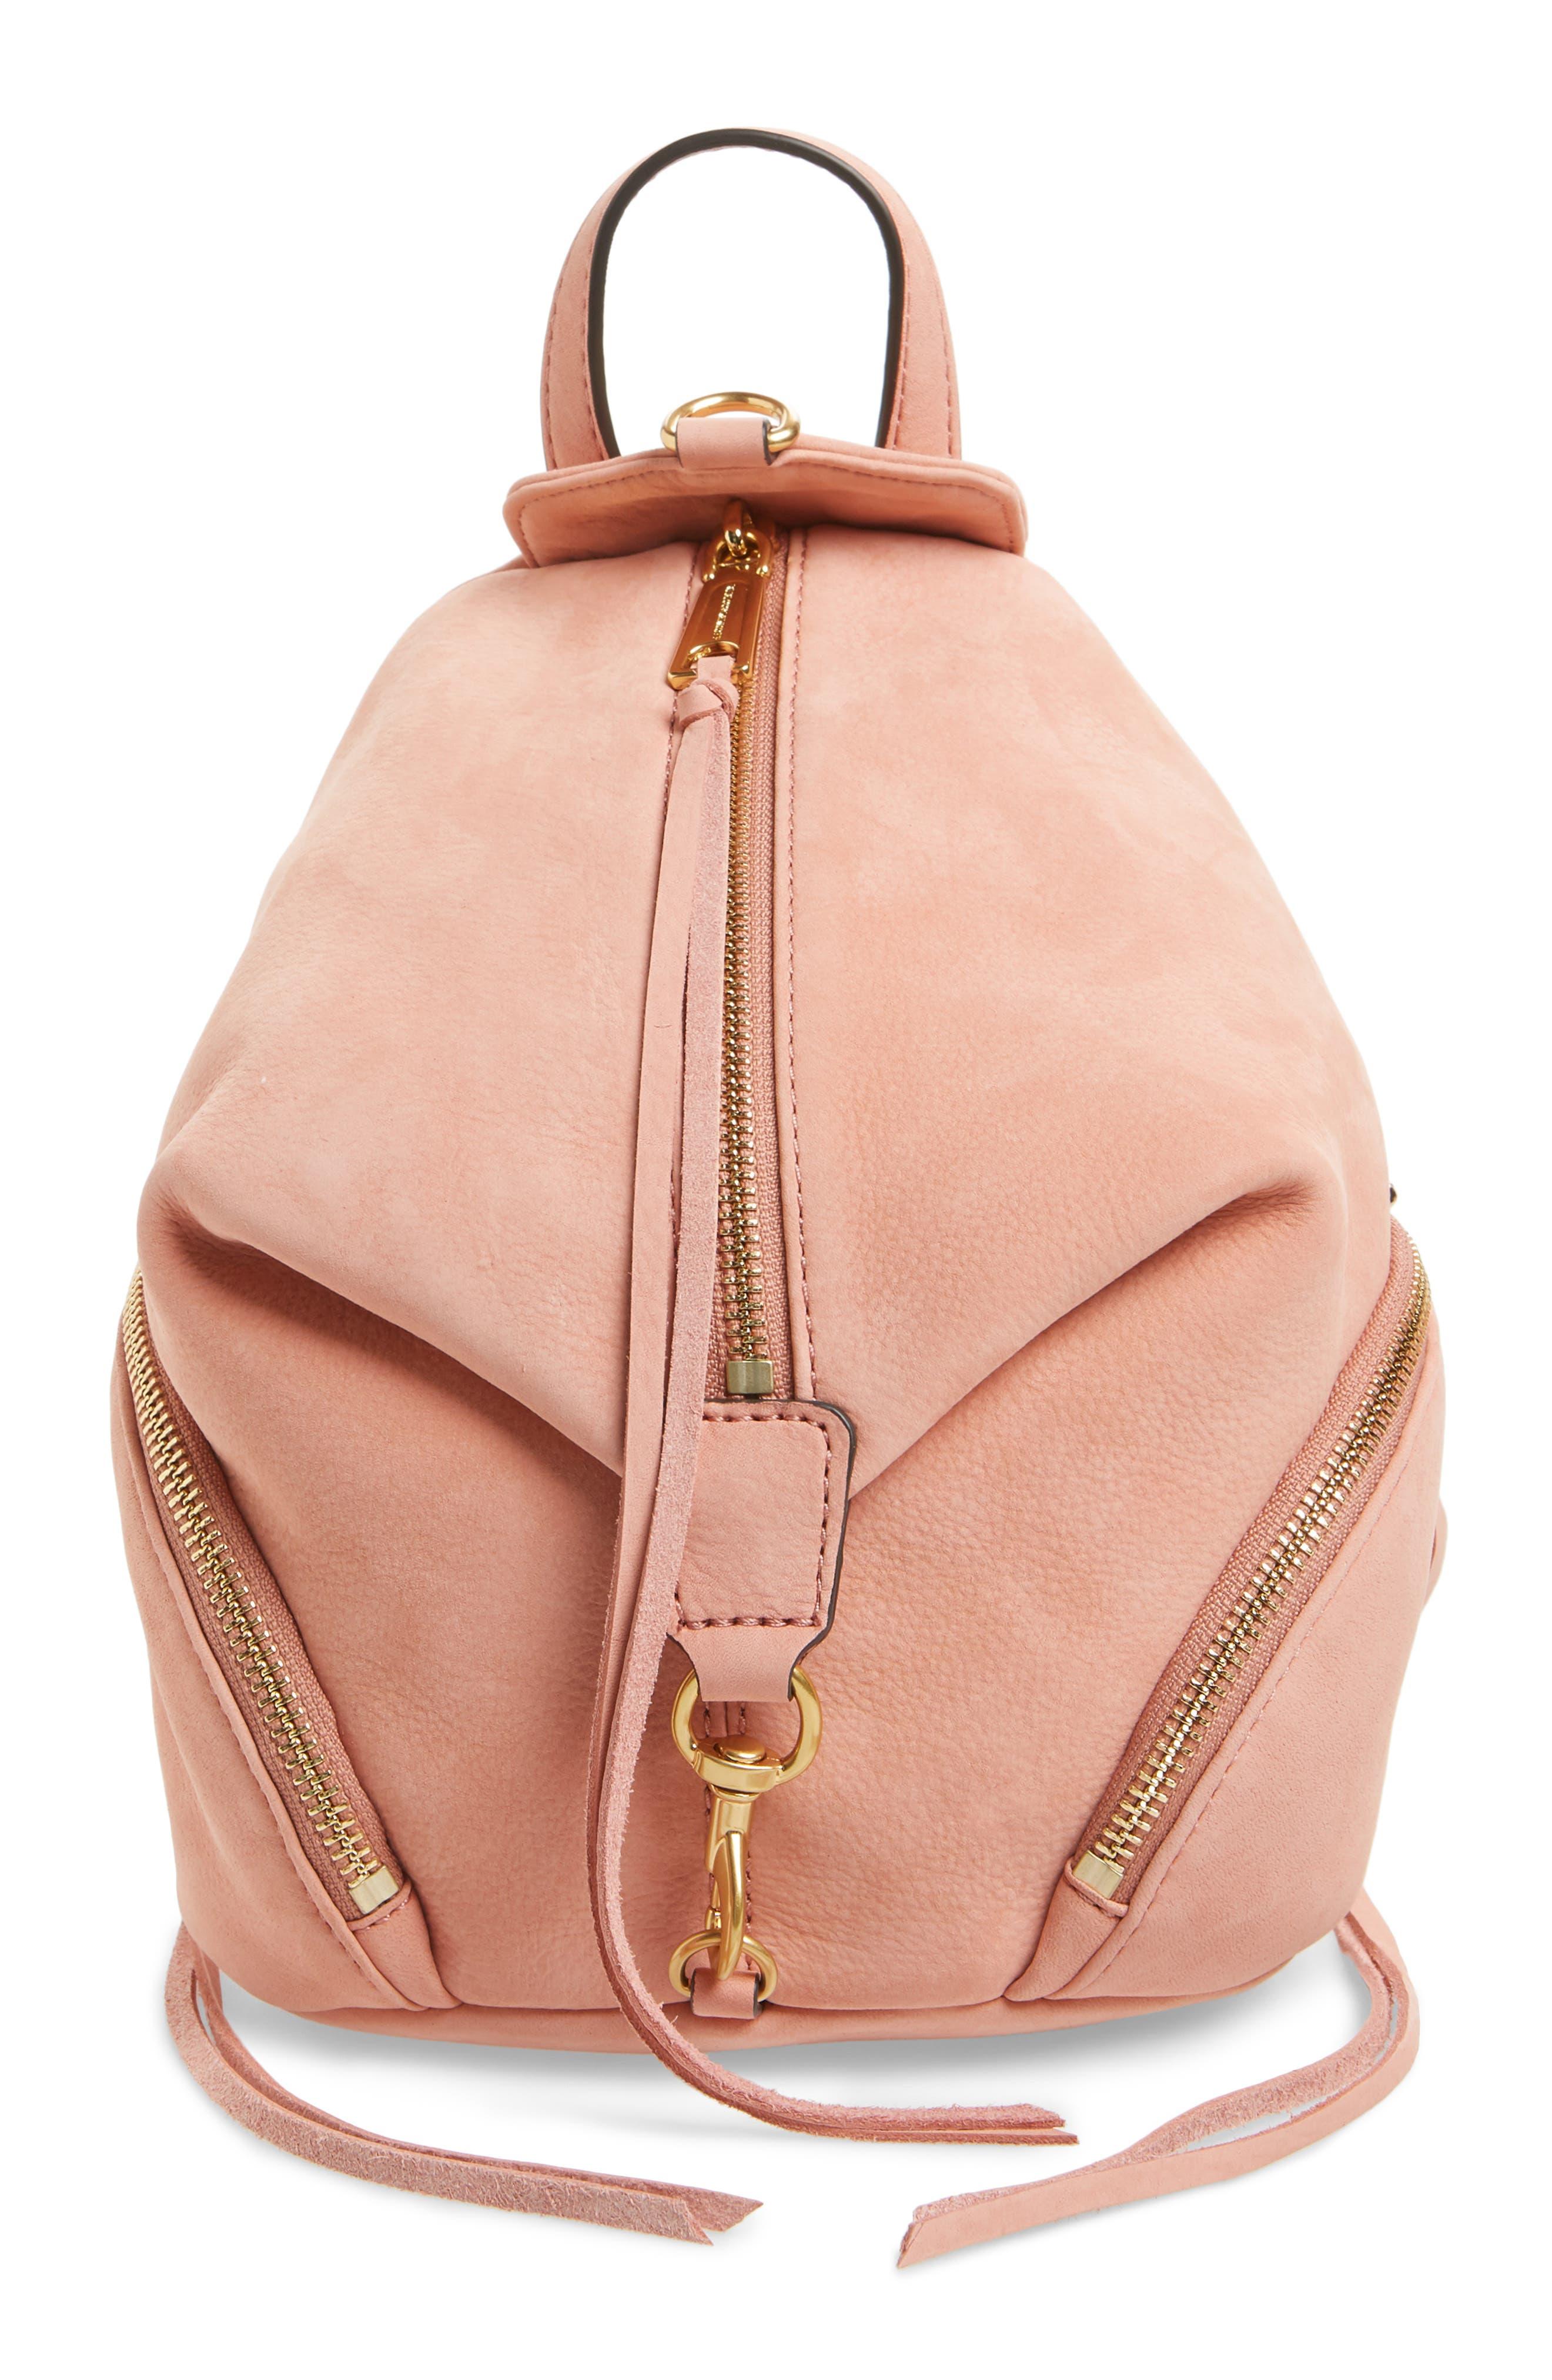 Mini Julian Nubuck Leather Convertible Backpack,                         Main,                         color, DUSTY PEACH